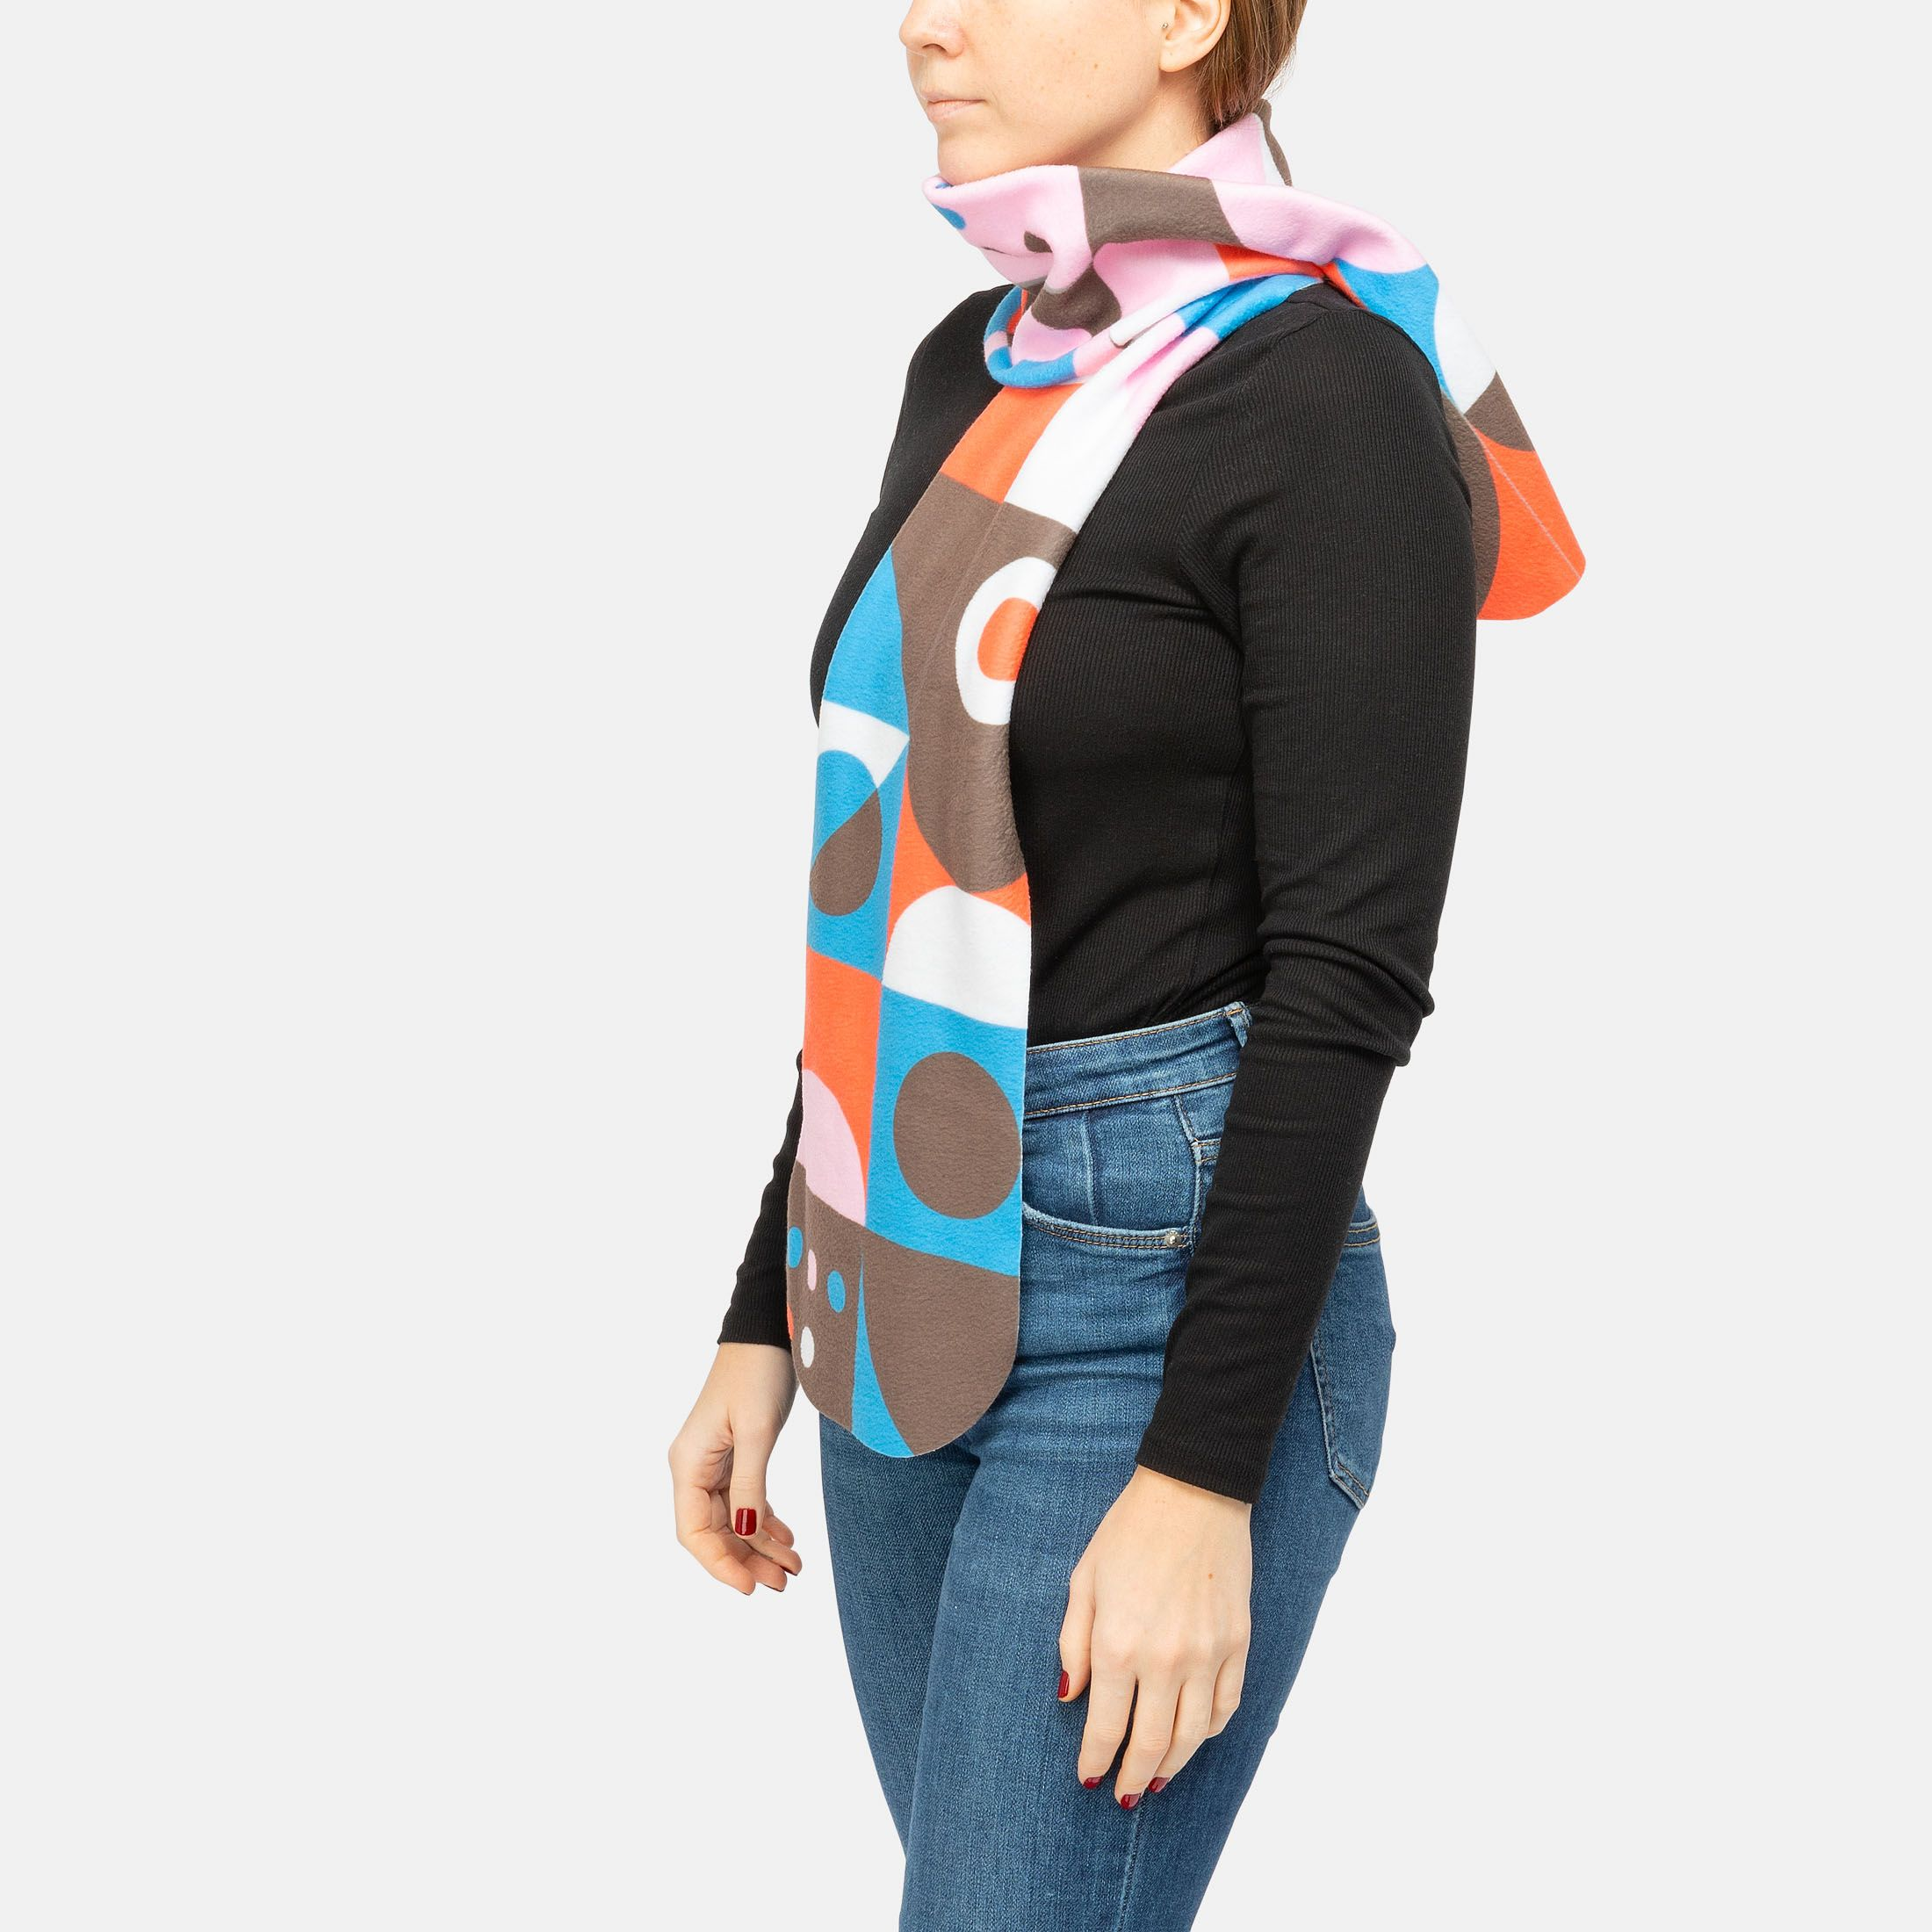 Designa din egen halsduk